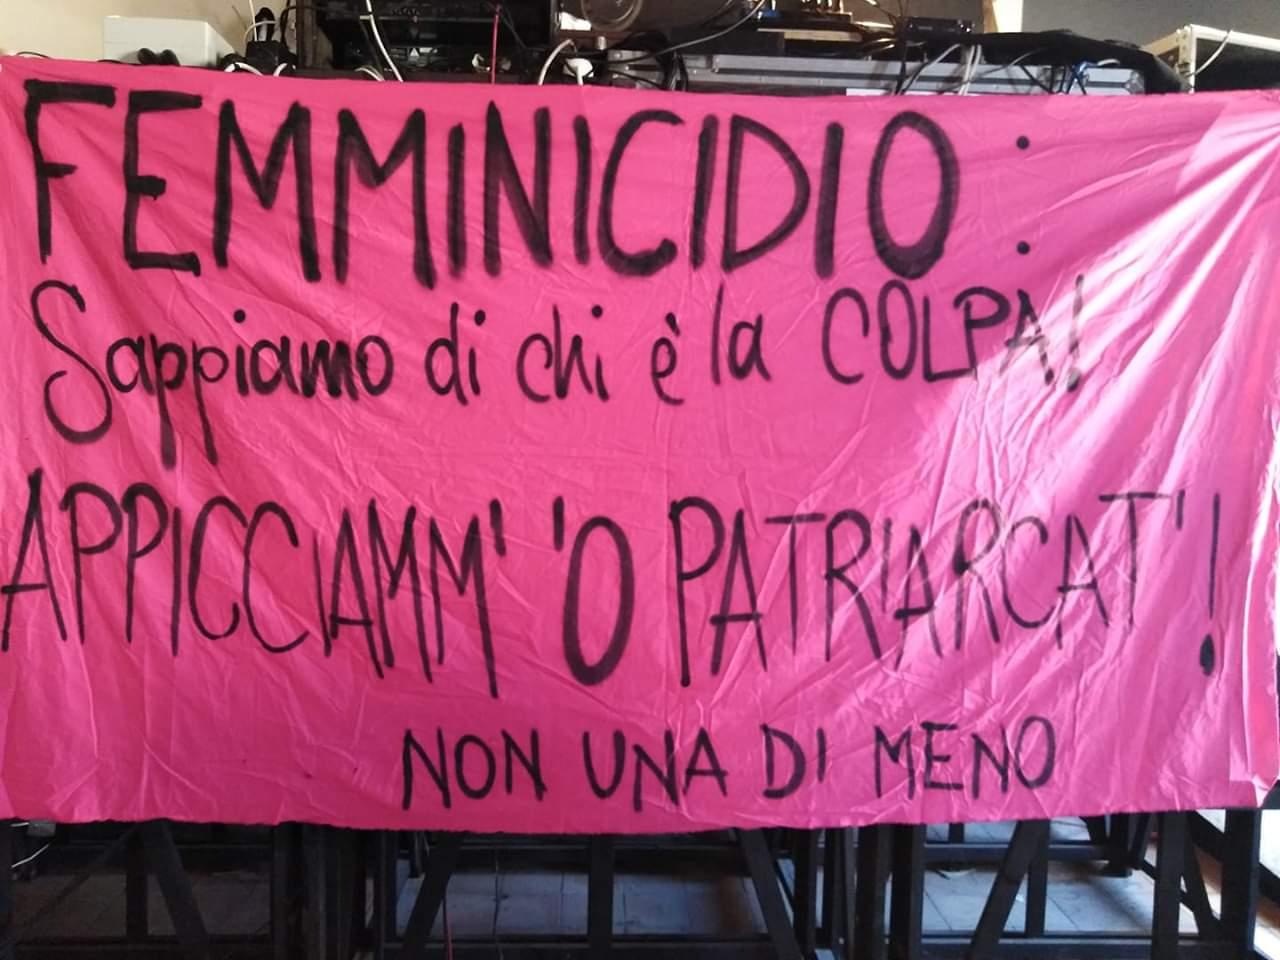 Roberto Dall'Olio: Femminicidi